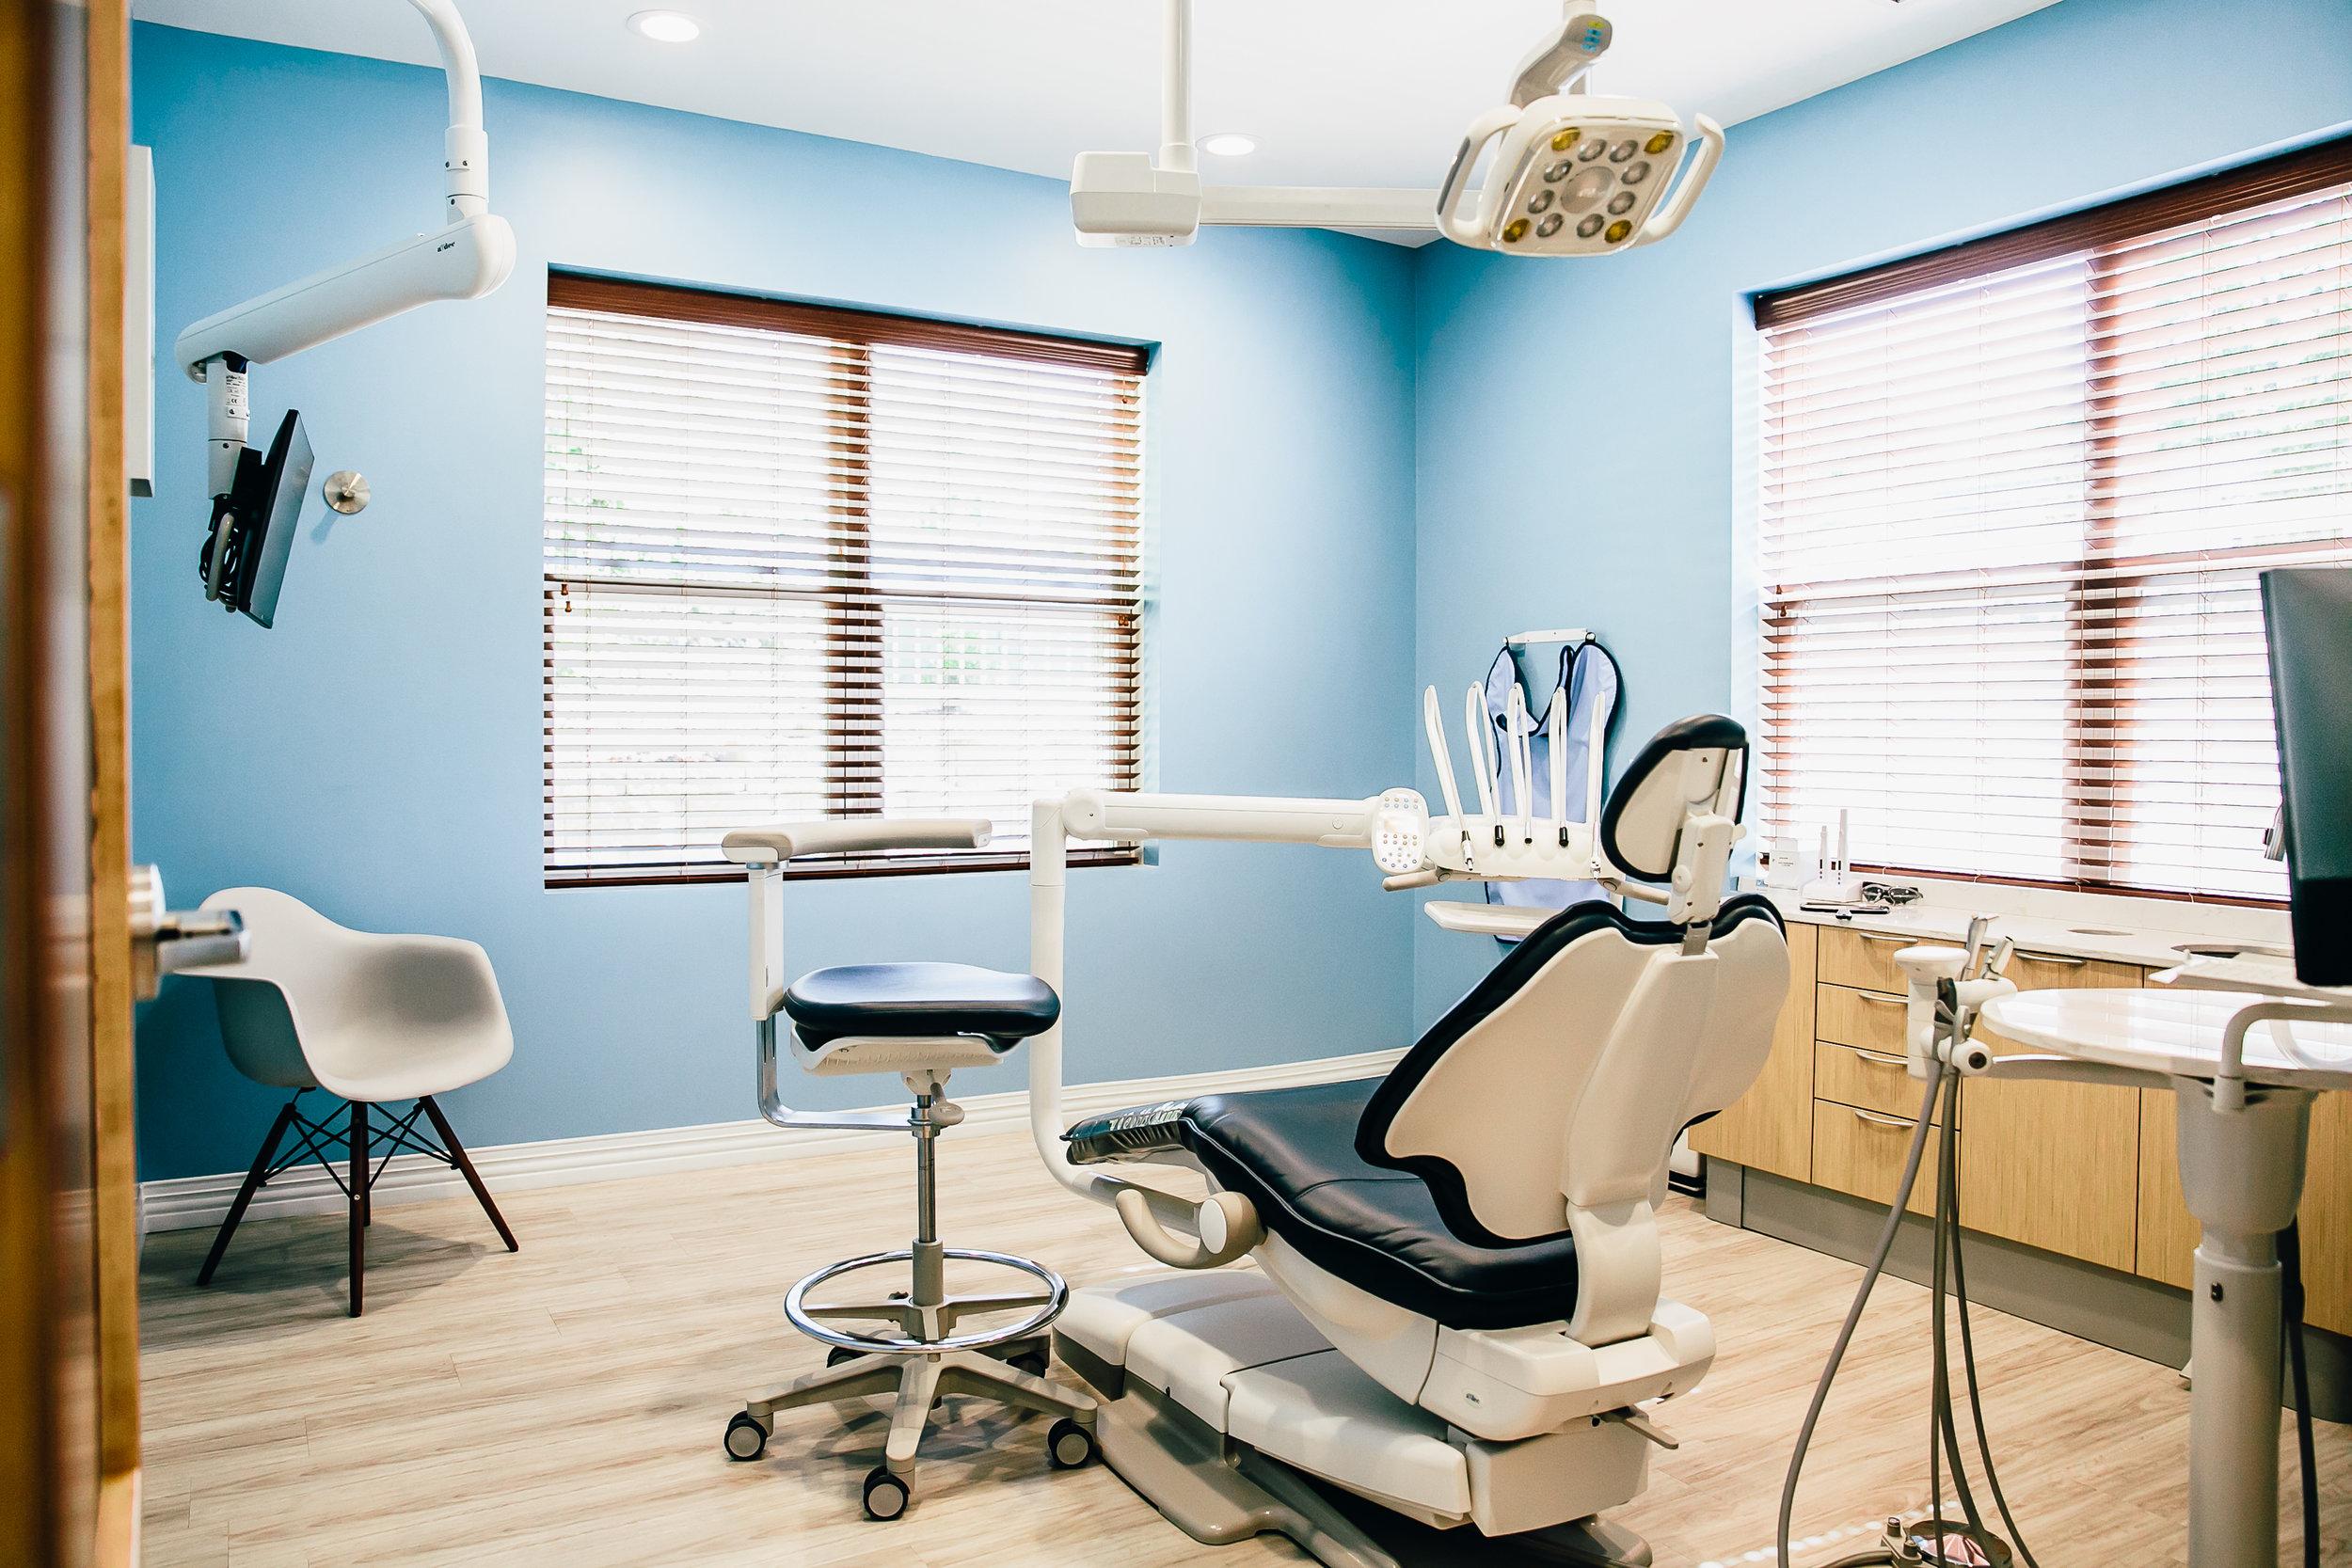 springsvillage_family_dentistry-17.jpg